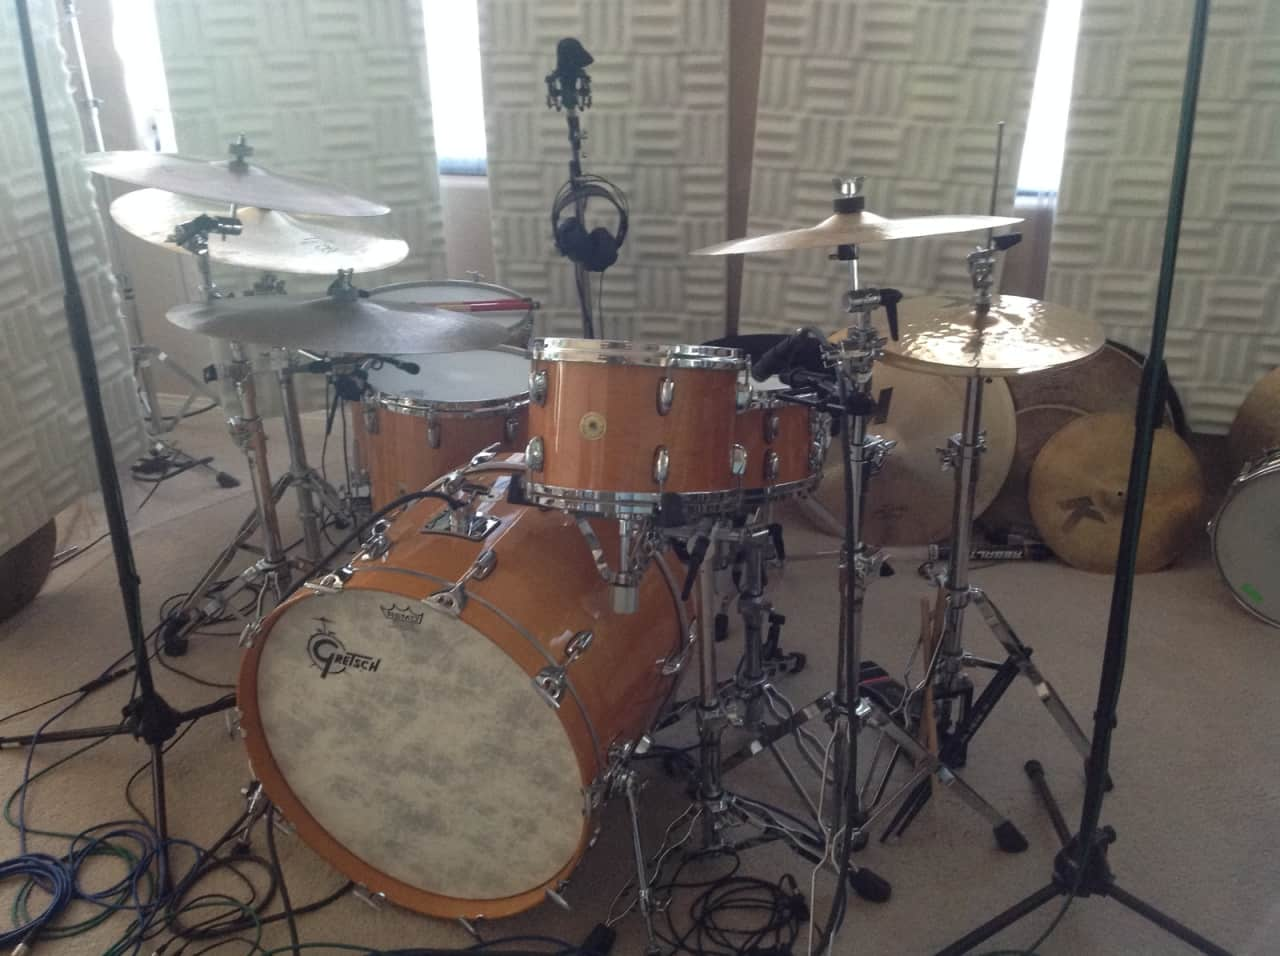 gretsch 125th anniversary rock legend drum kit 2008 reverb. Black Bedroom Furniture Sets. Home Design Ideas